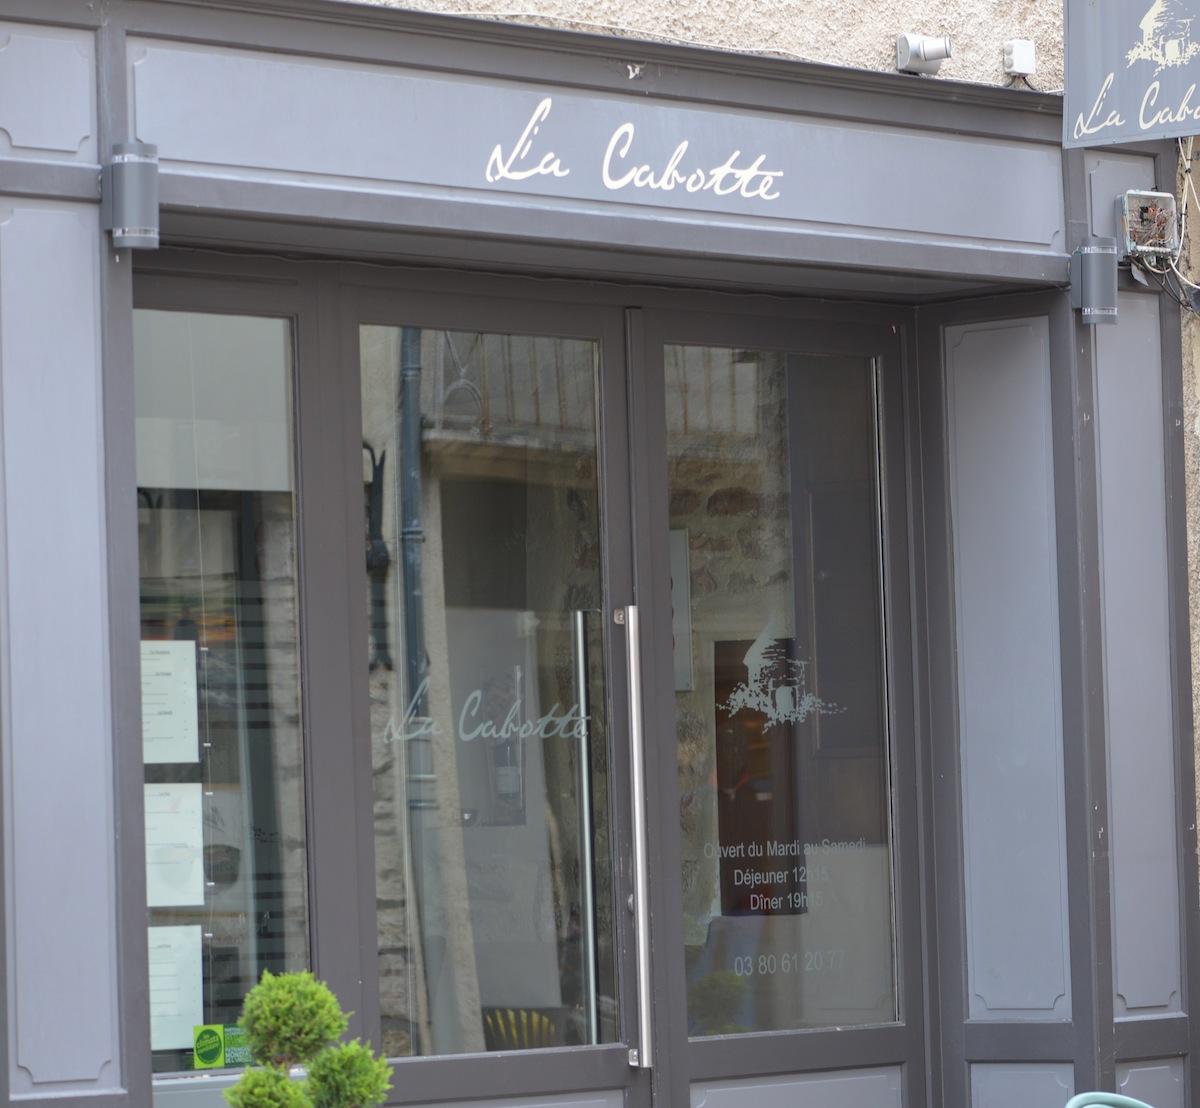 La Cabotte Nuits St Georges - a very good bistro